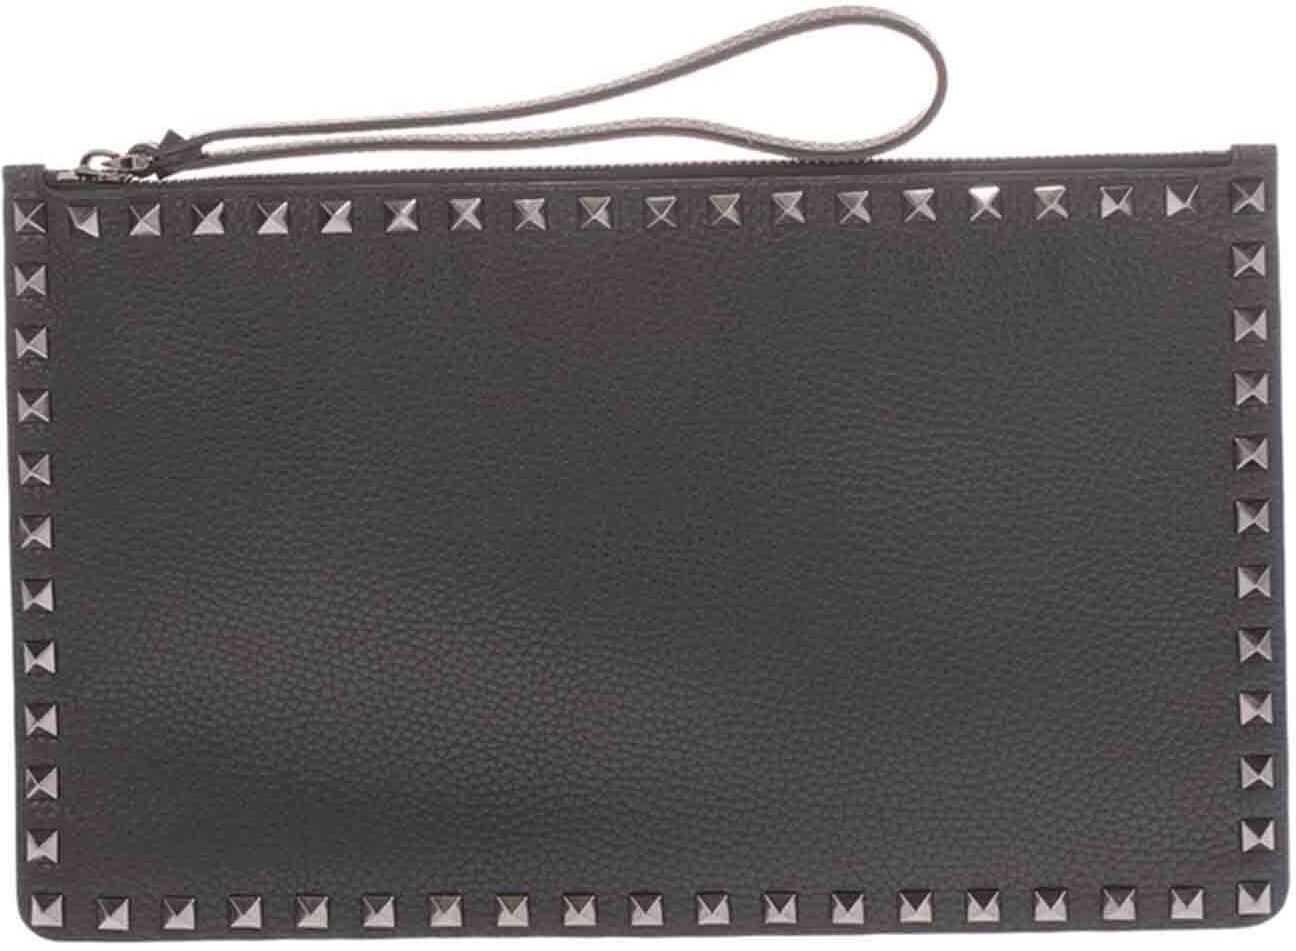 Valentino Garavani Rockstud Clutch Bag In Black UY2P0692VAP 0NO Black imagine b-mall.ro